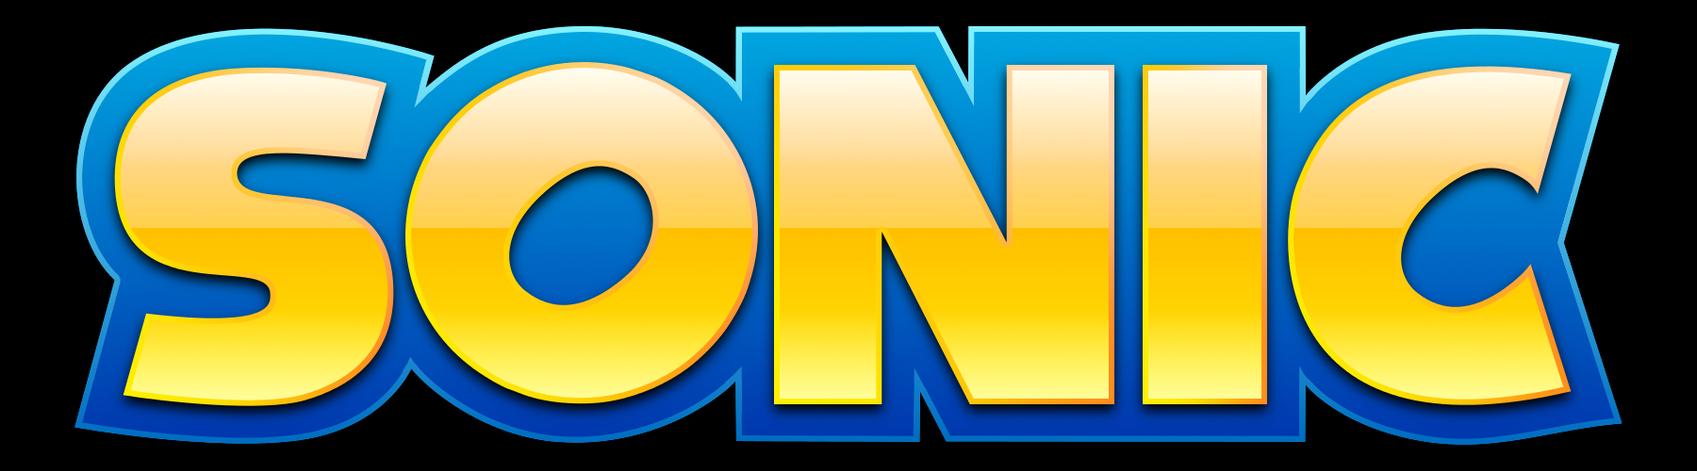 Sonic the hedgehog logo png